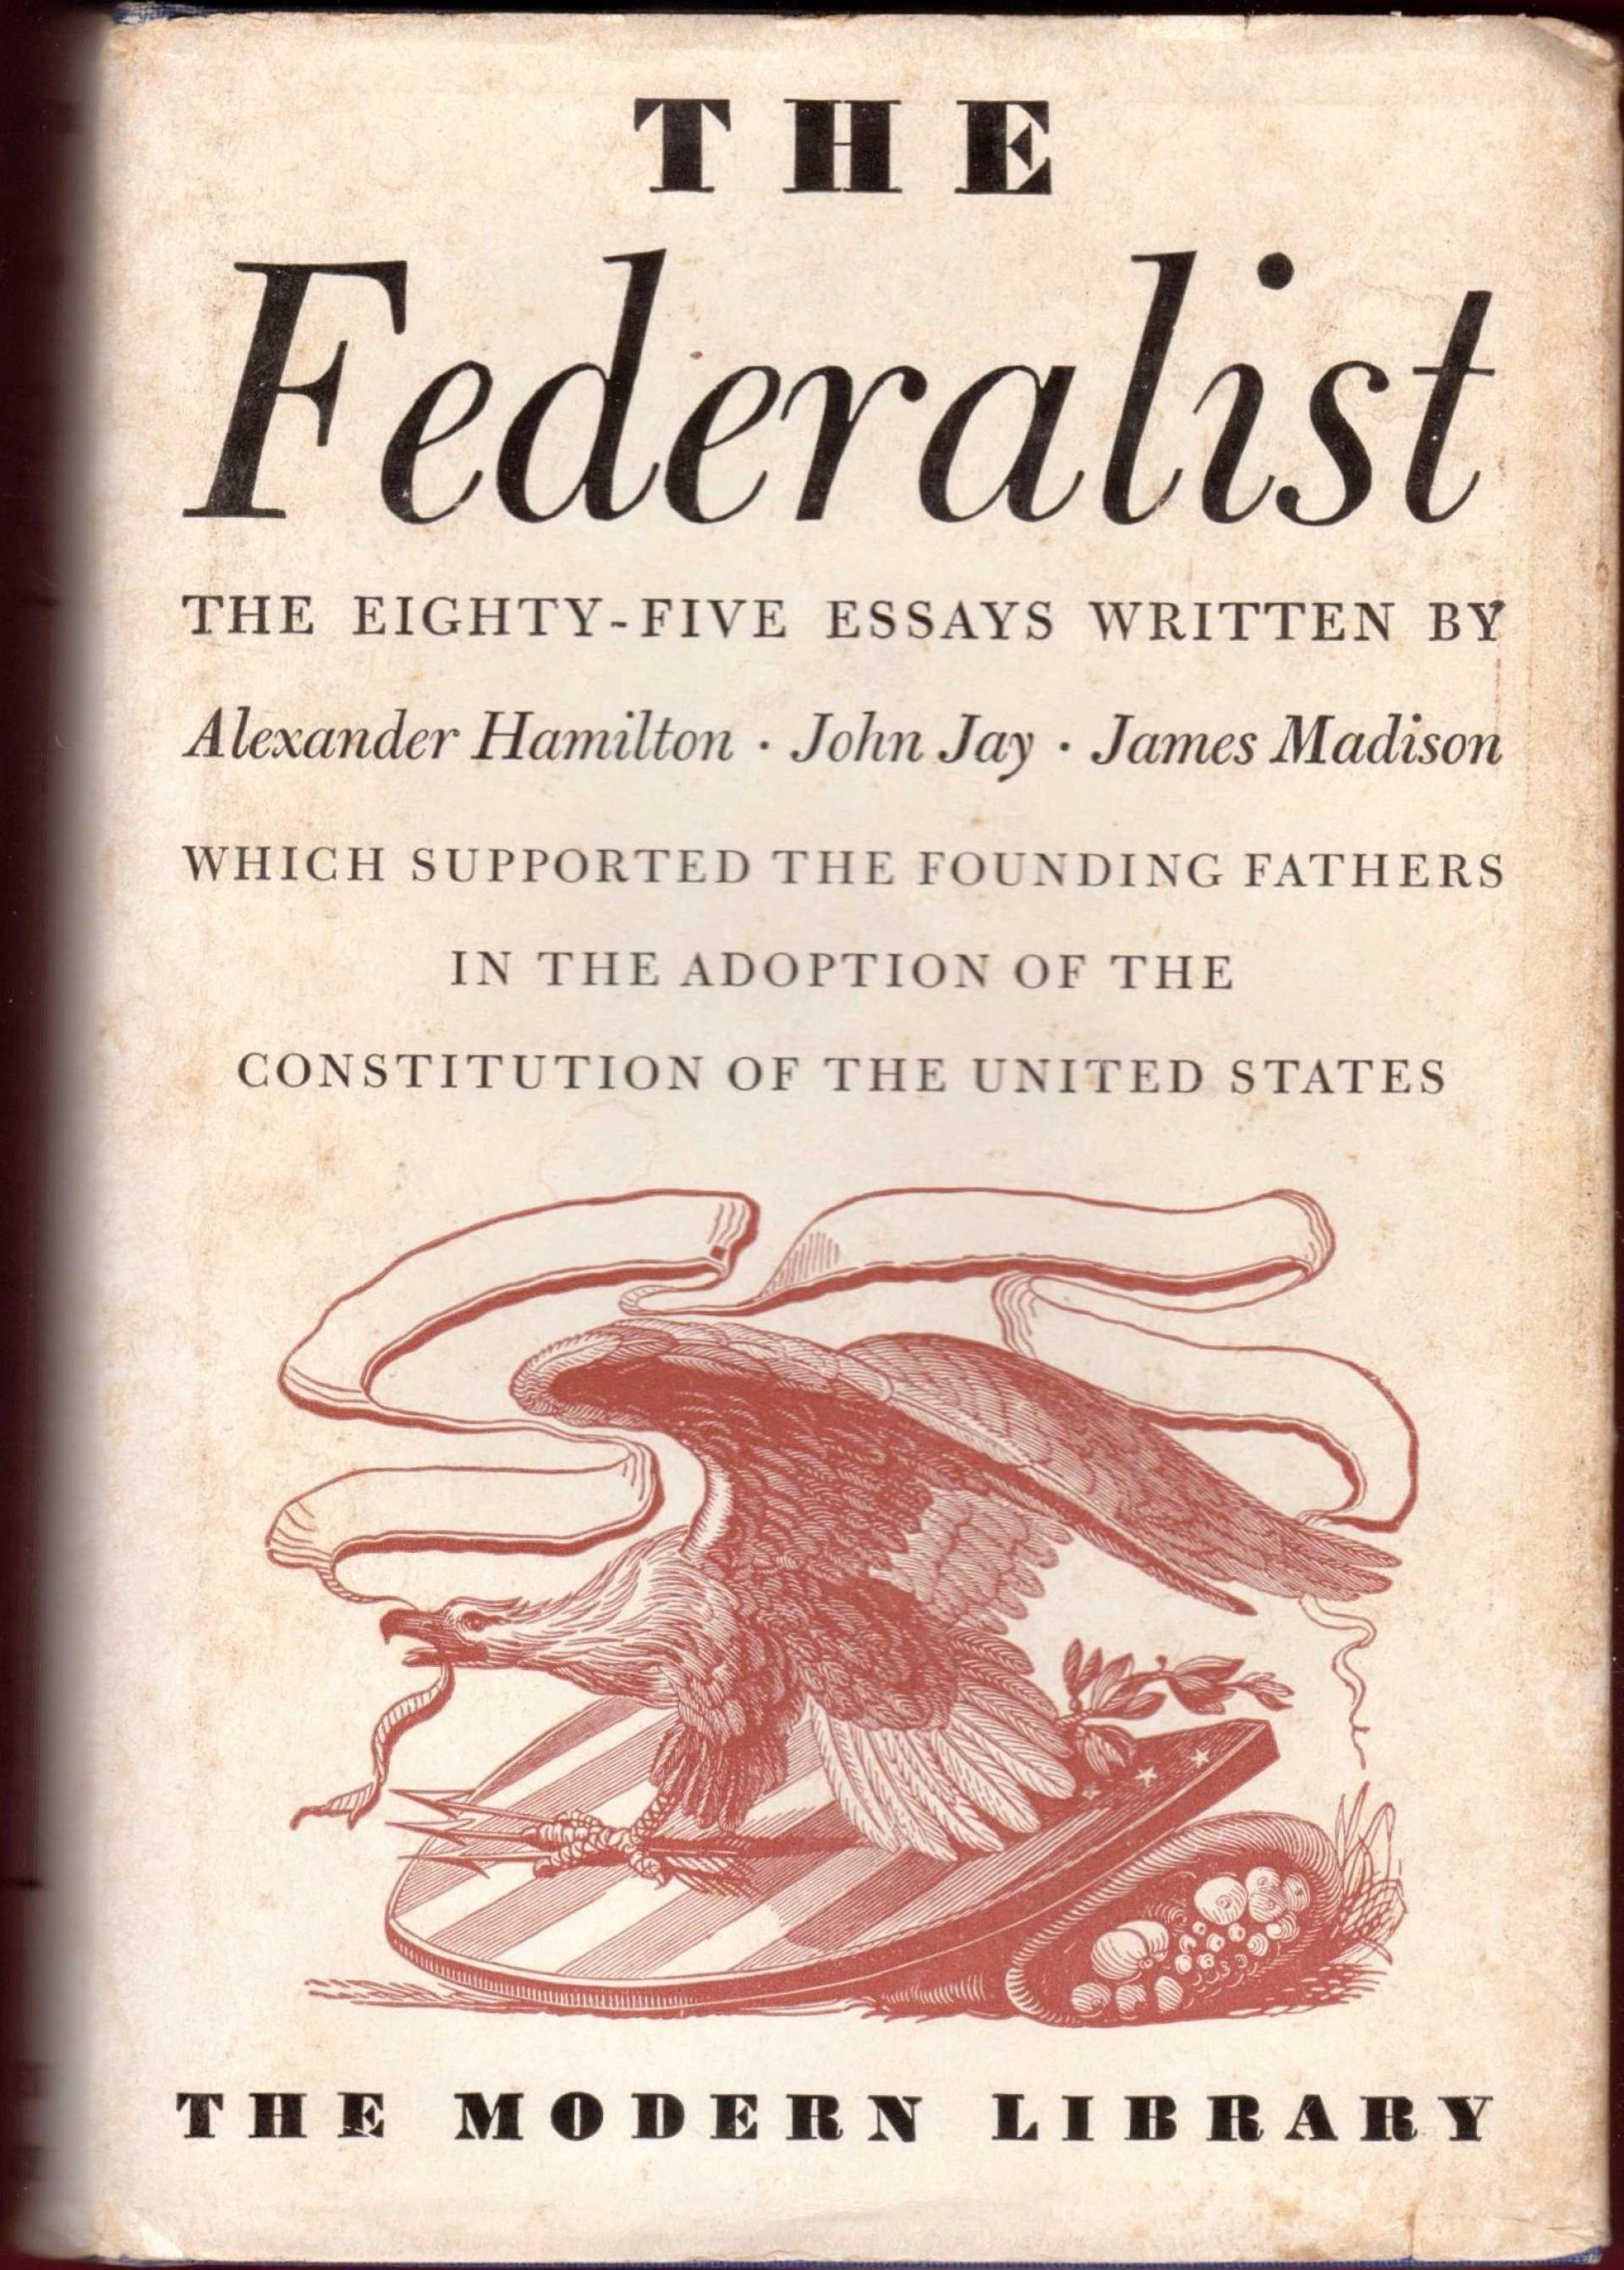 012 Alexander Hamilton Essays 91n4zdfy2el Essay Frightening Federalist Papers Summary 51 1920